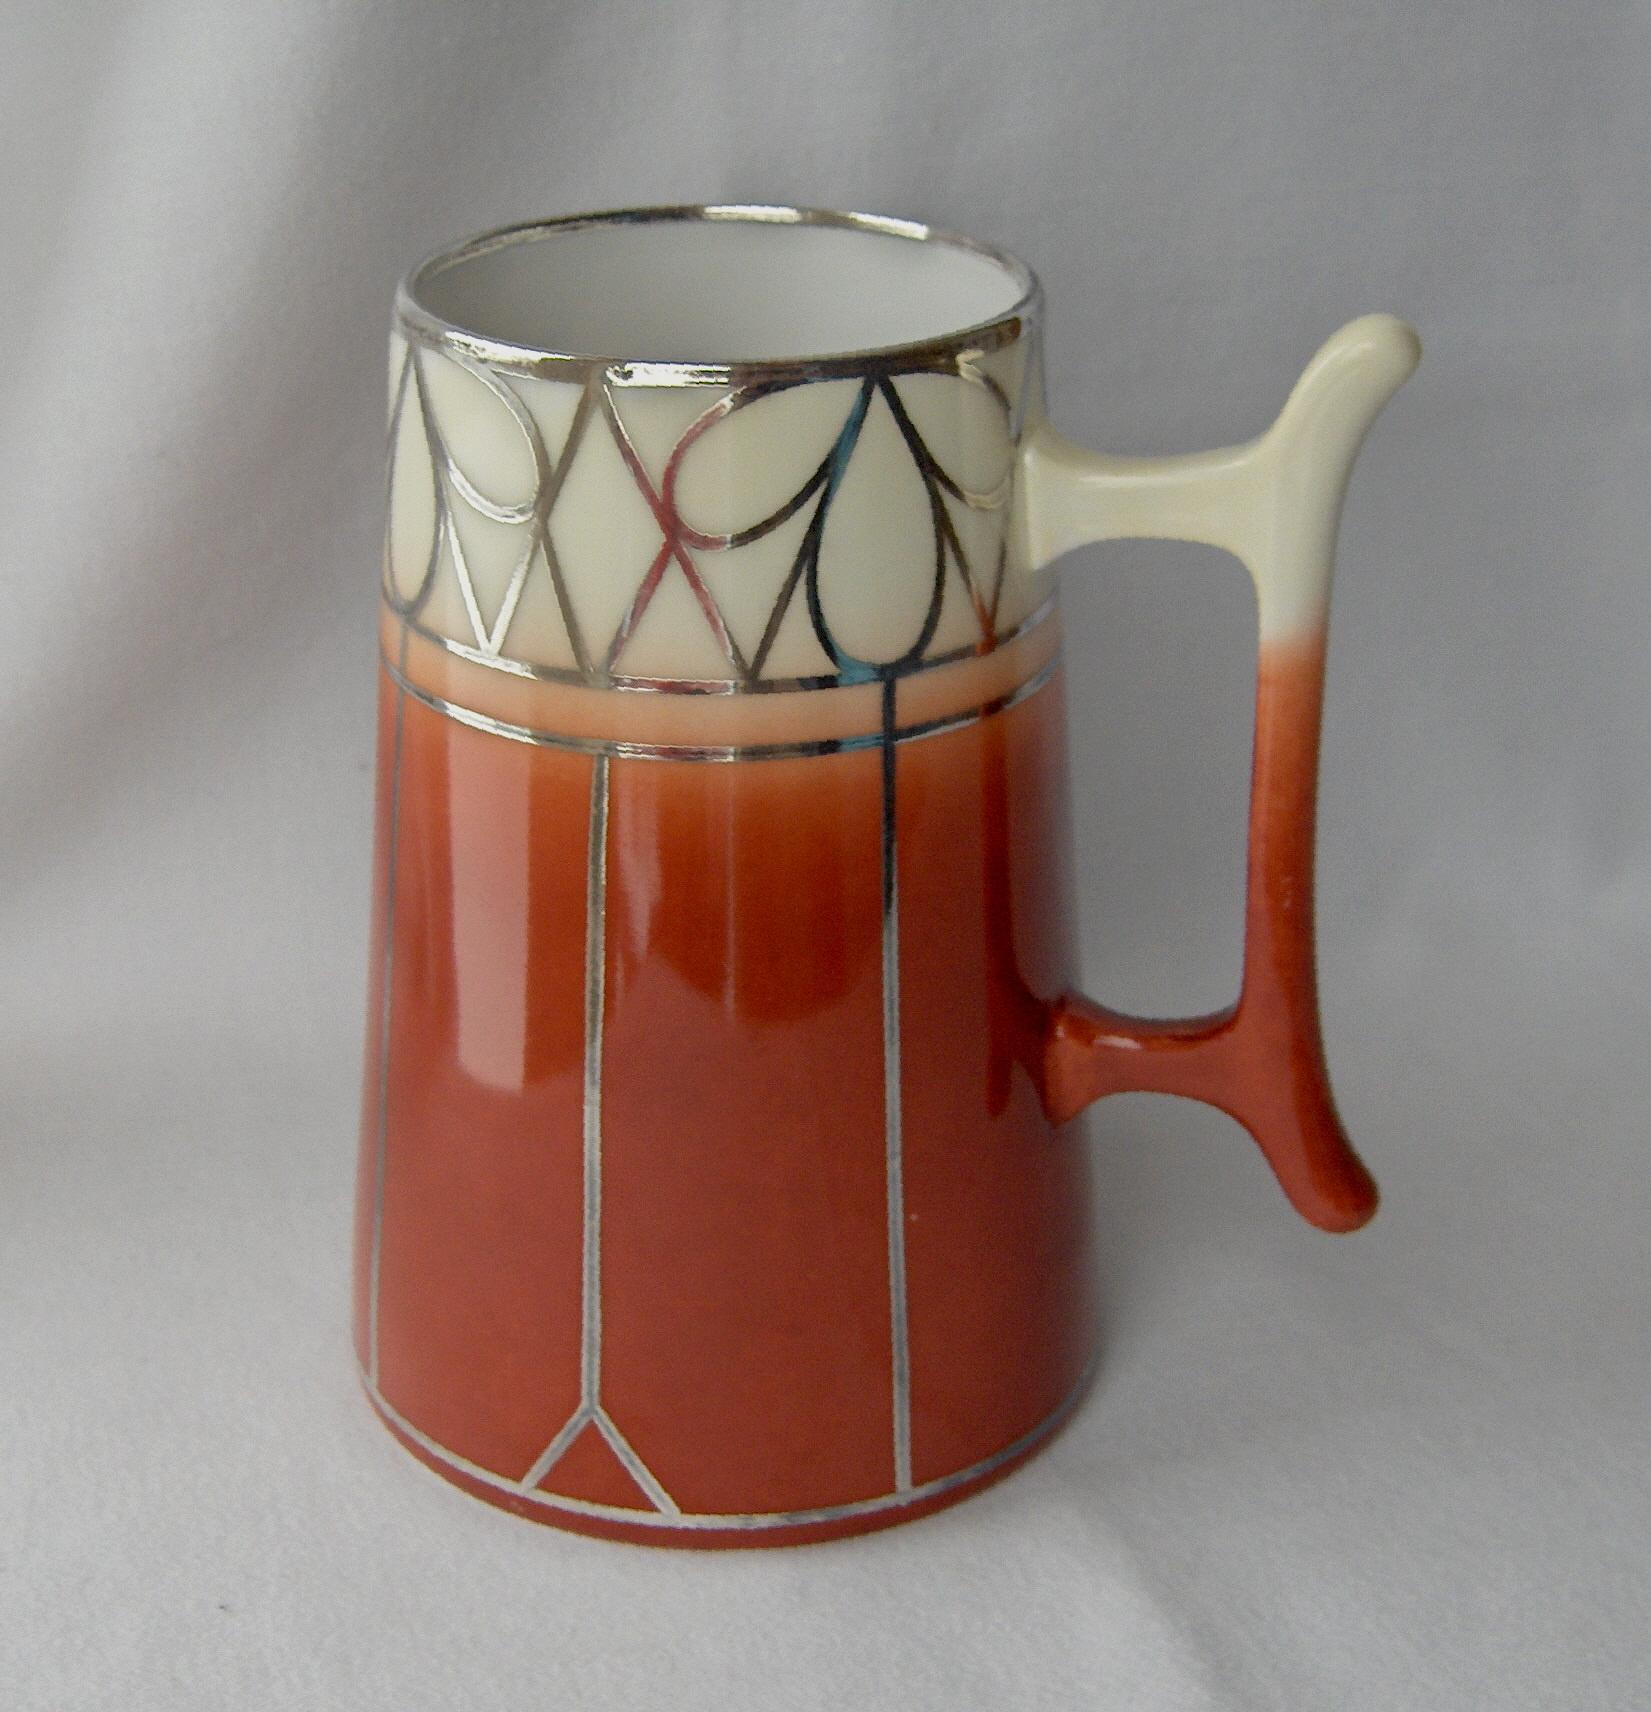 Two Willets Belleek Tankards, porcelain blanks hand